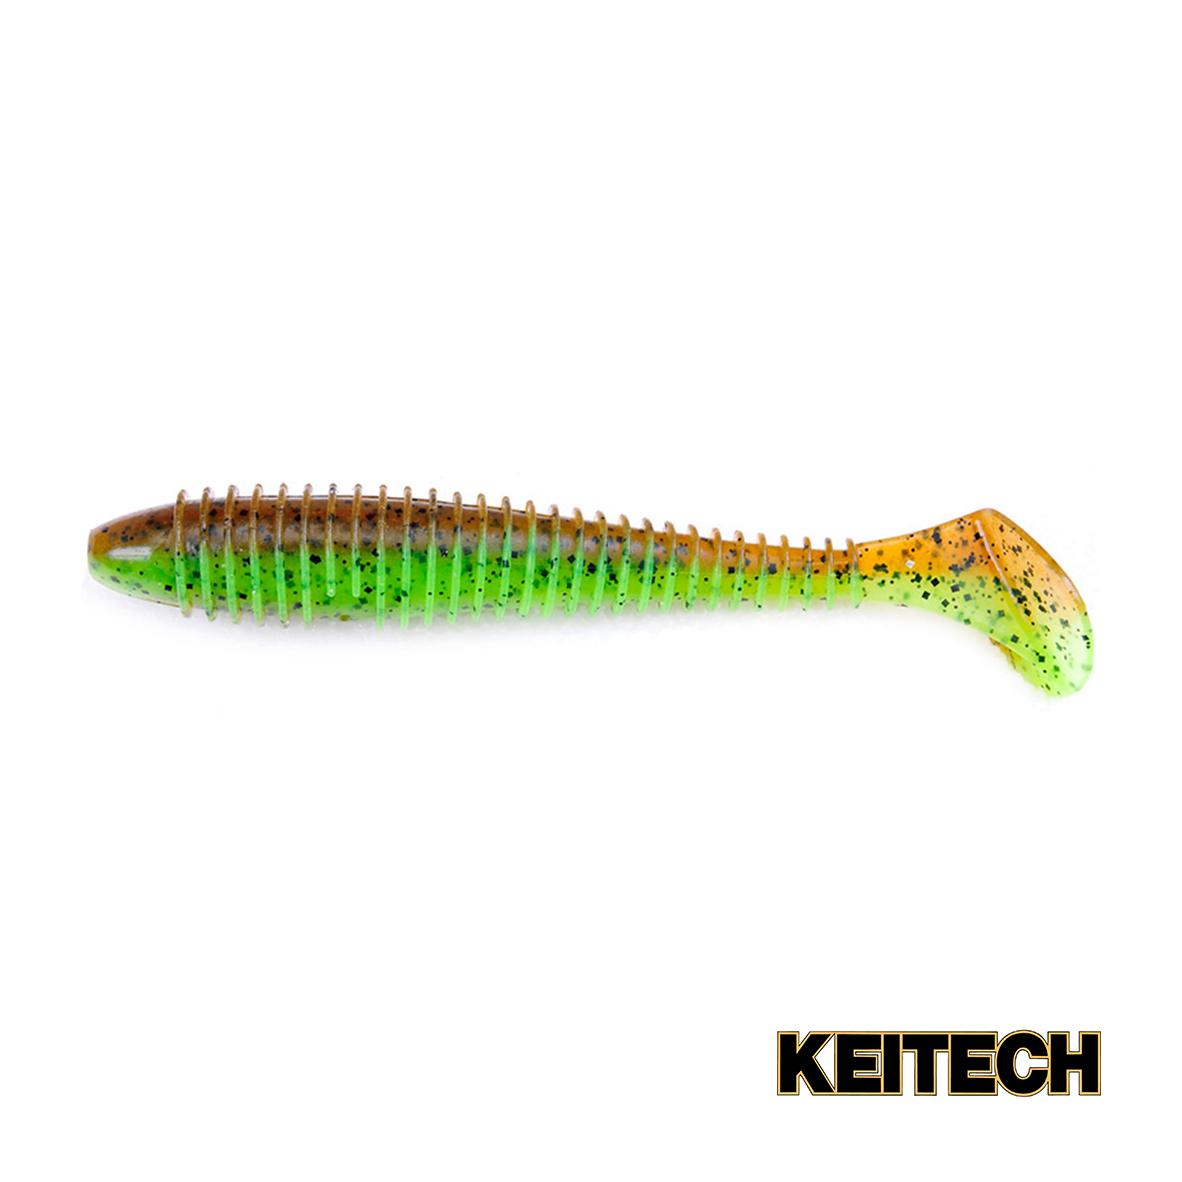 "Силикон Keitech Swing Impact FAT 4.3"" (5 шт/упак) ц:401 greenpump"